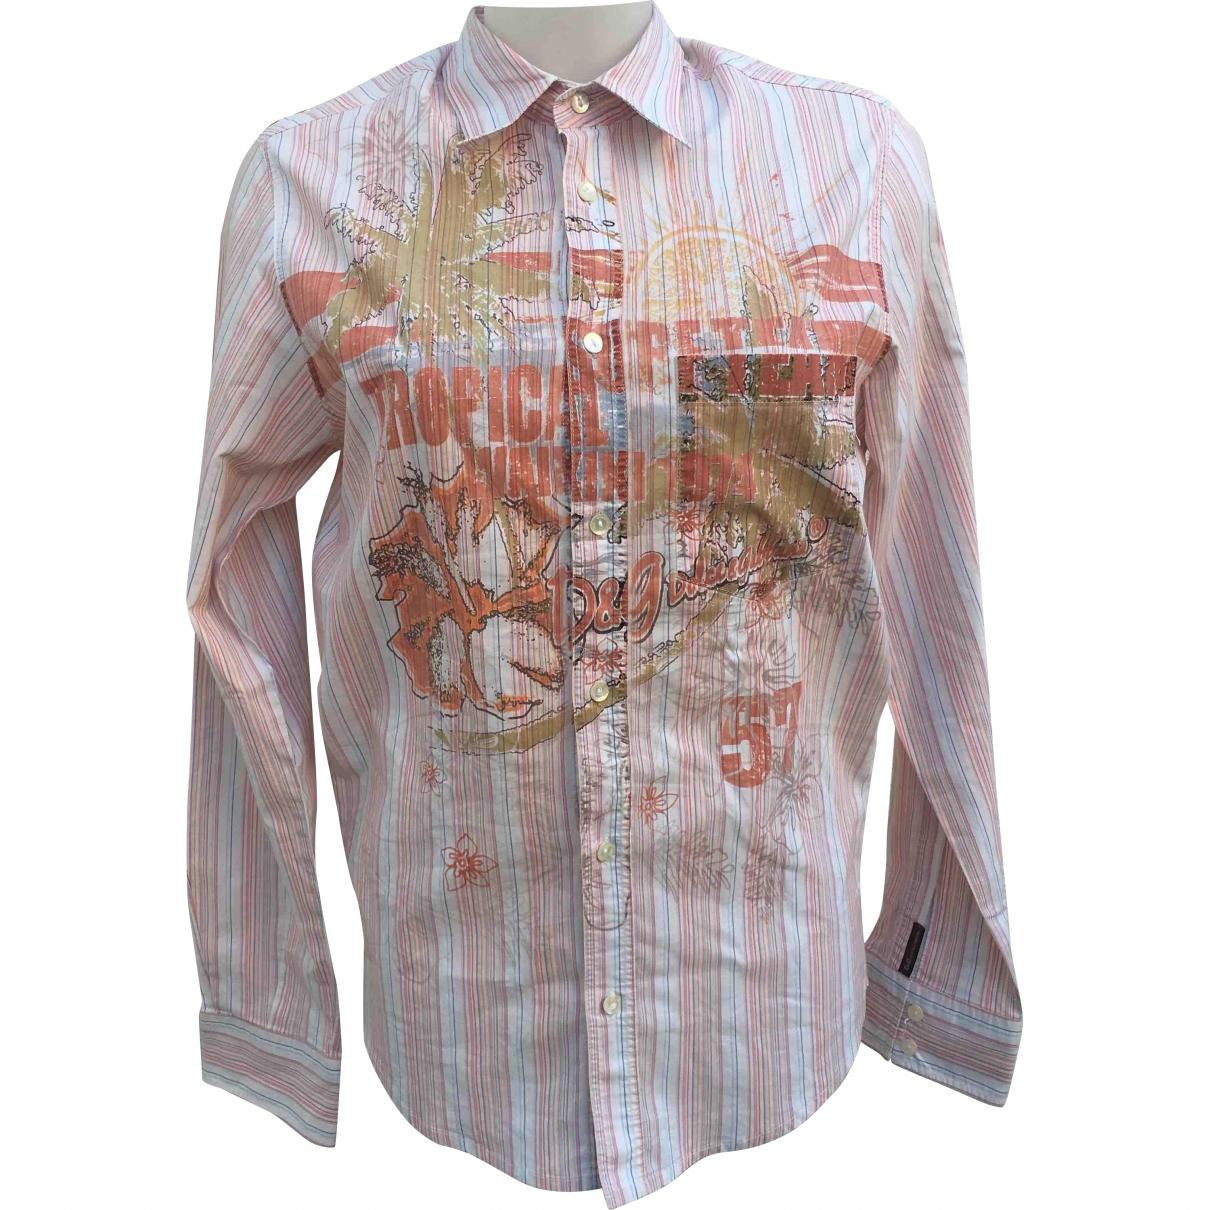 Camisas D&g